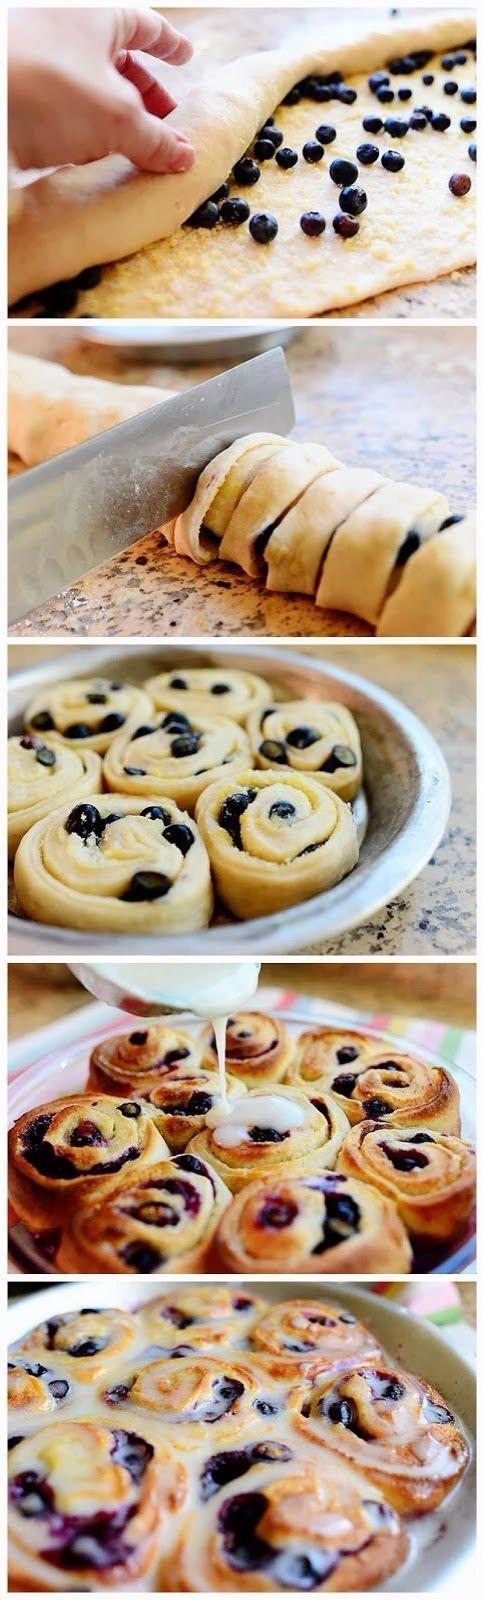 Blueberry Lemon Sweet Rolls - Use Pilsbury Rolls For The Dough ...